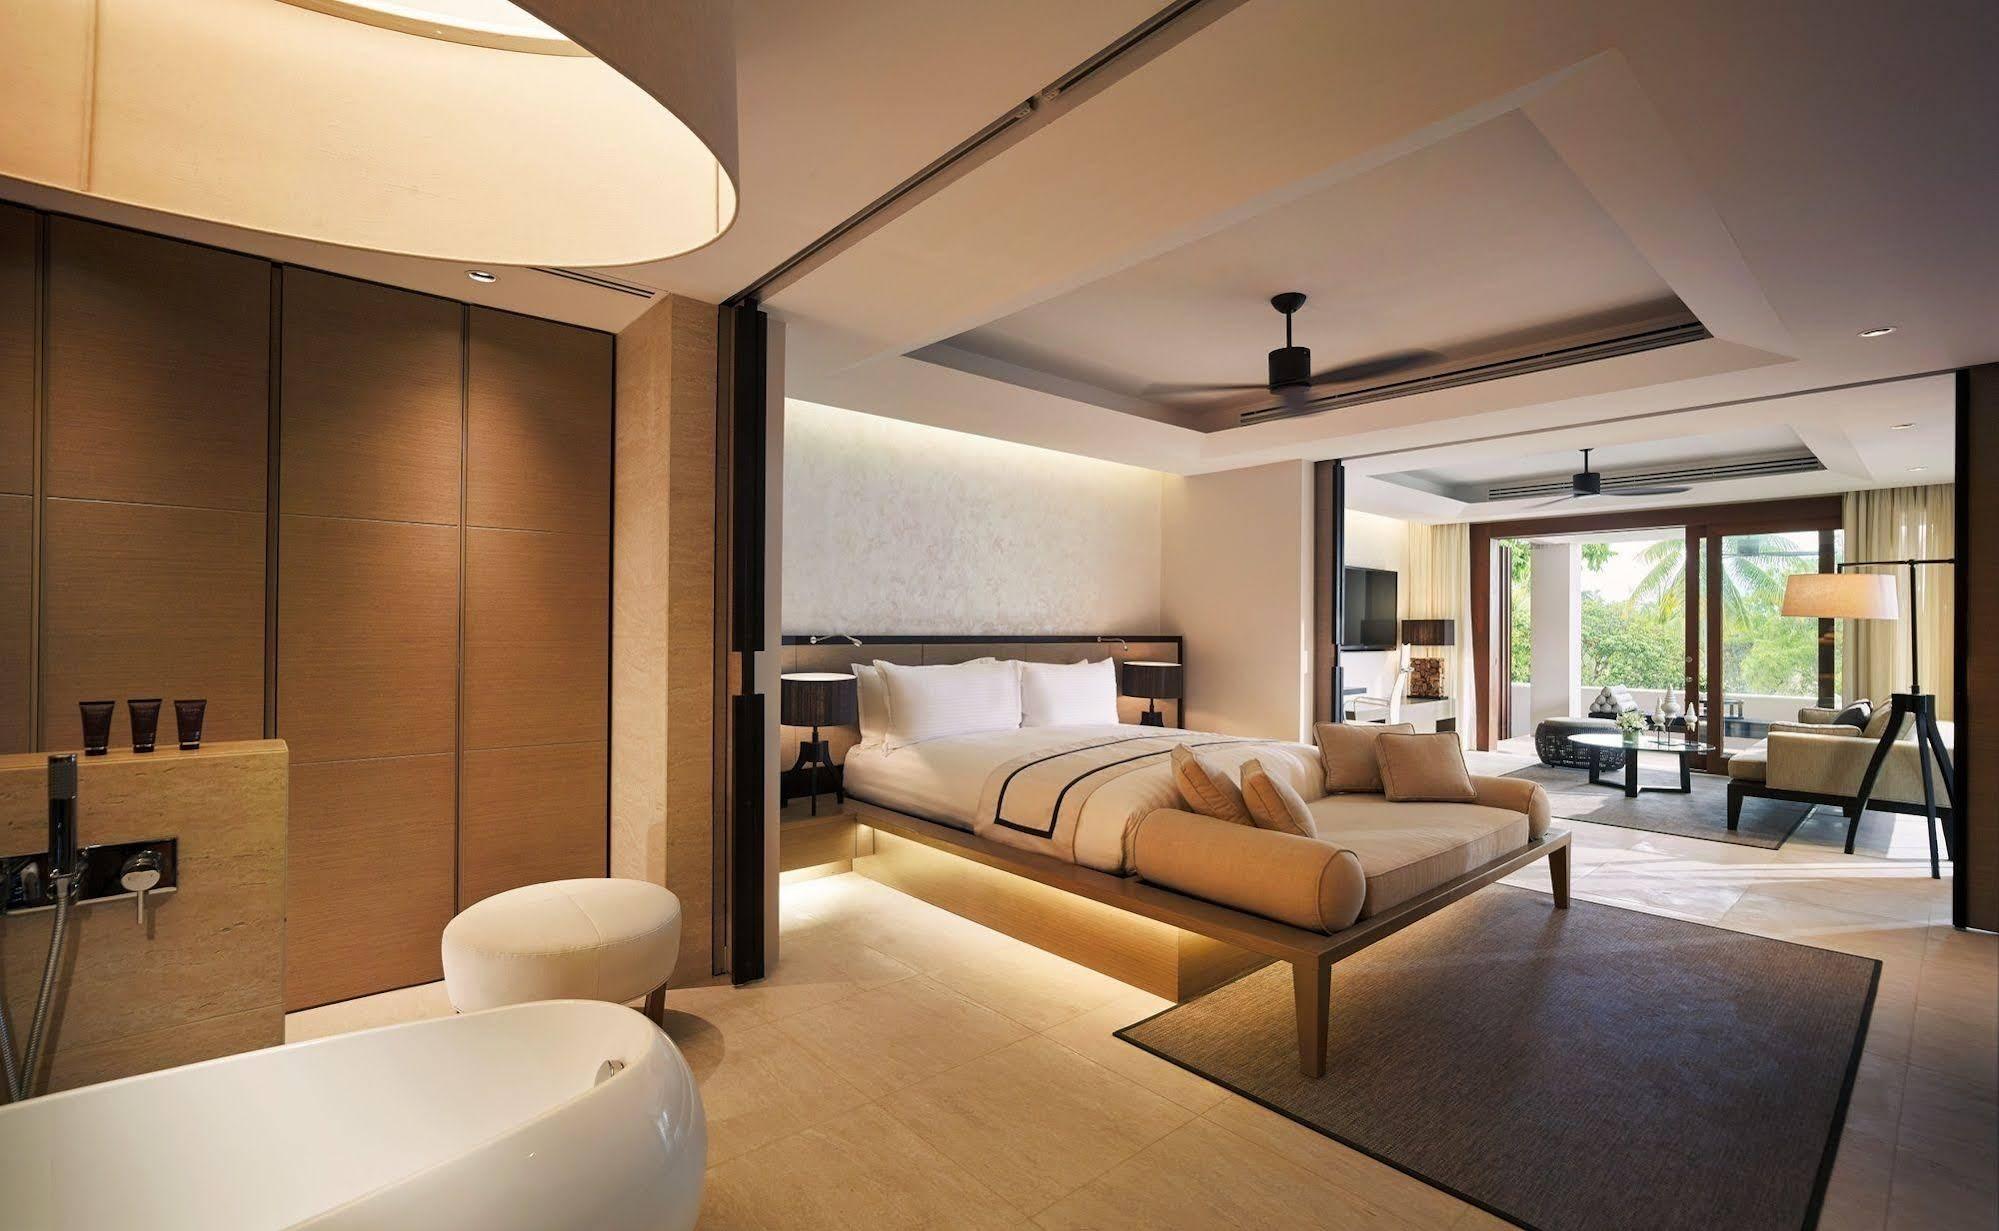 The RitzCarlton Koh Samui